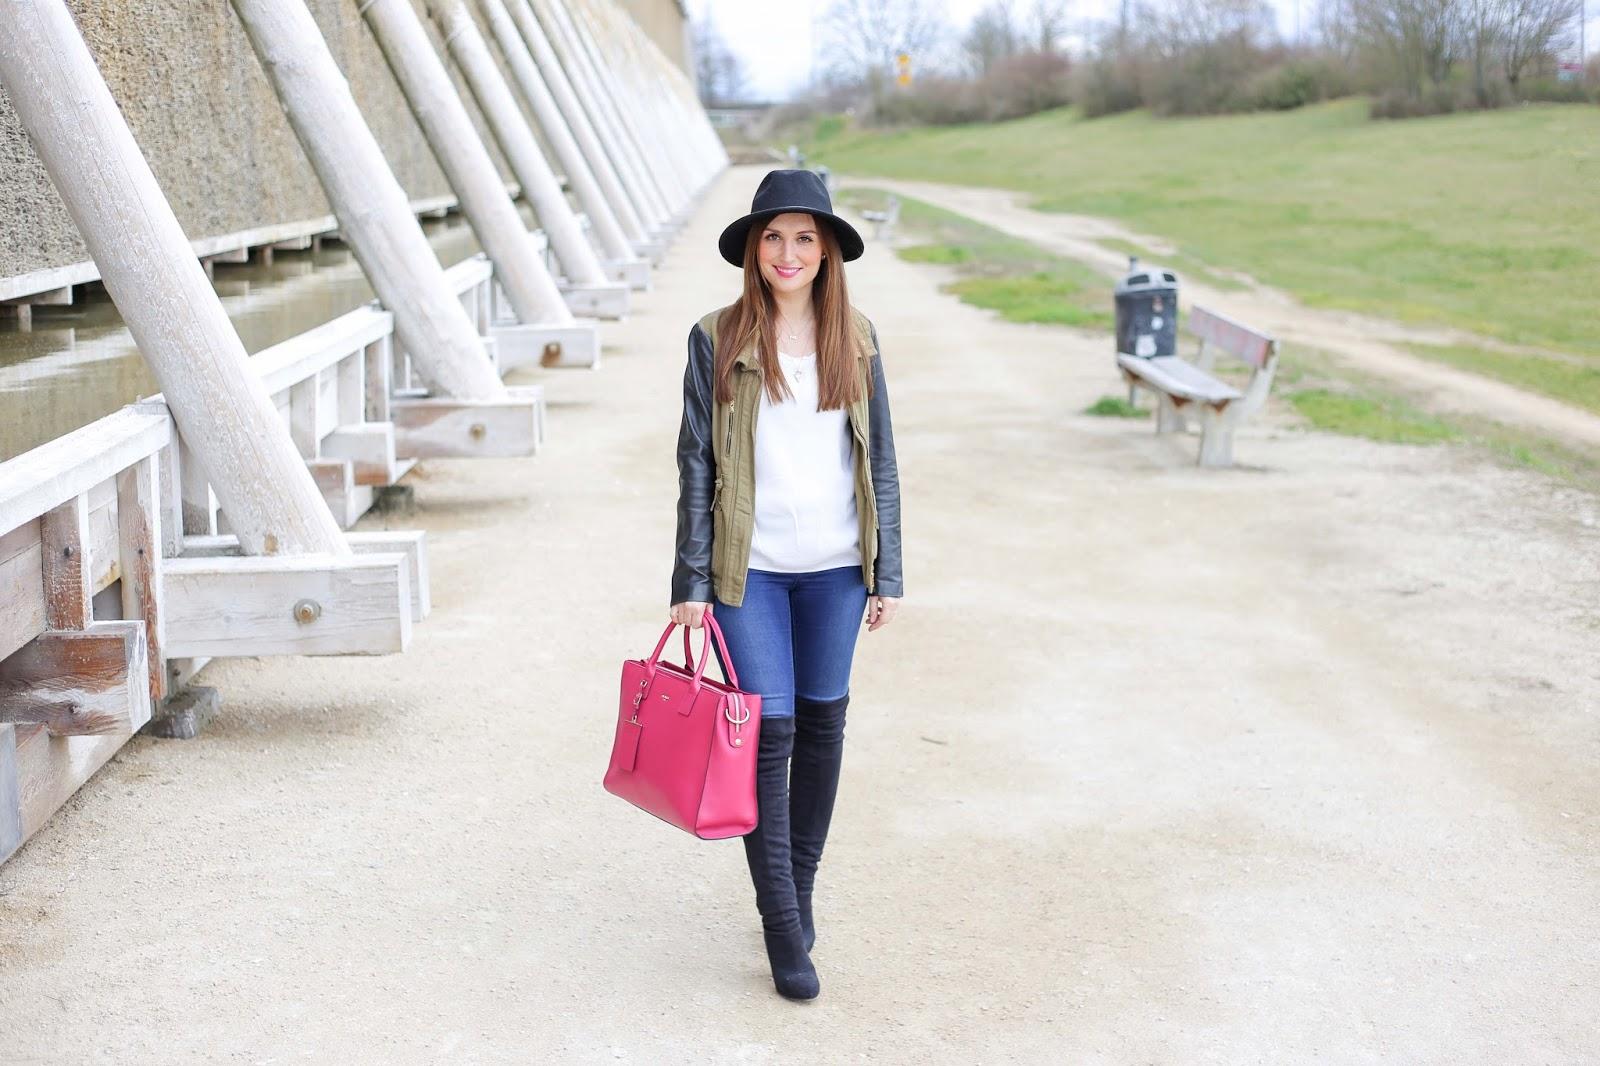 PICARD - German Fashionblogger - Fashionblogger aus Deutschland- Sheinside Rock - Sheinside Outfit - Sheinside Blogger - Frankfurt Fashionblogger - Fashionstylebyjohanna